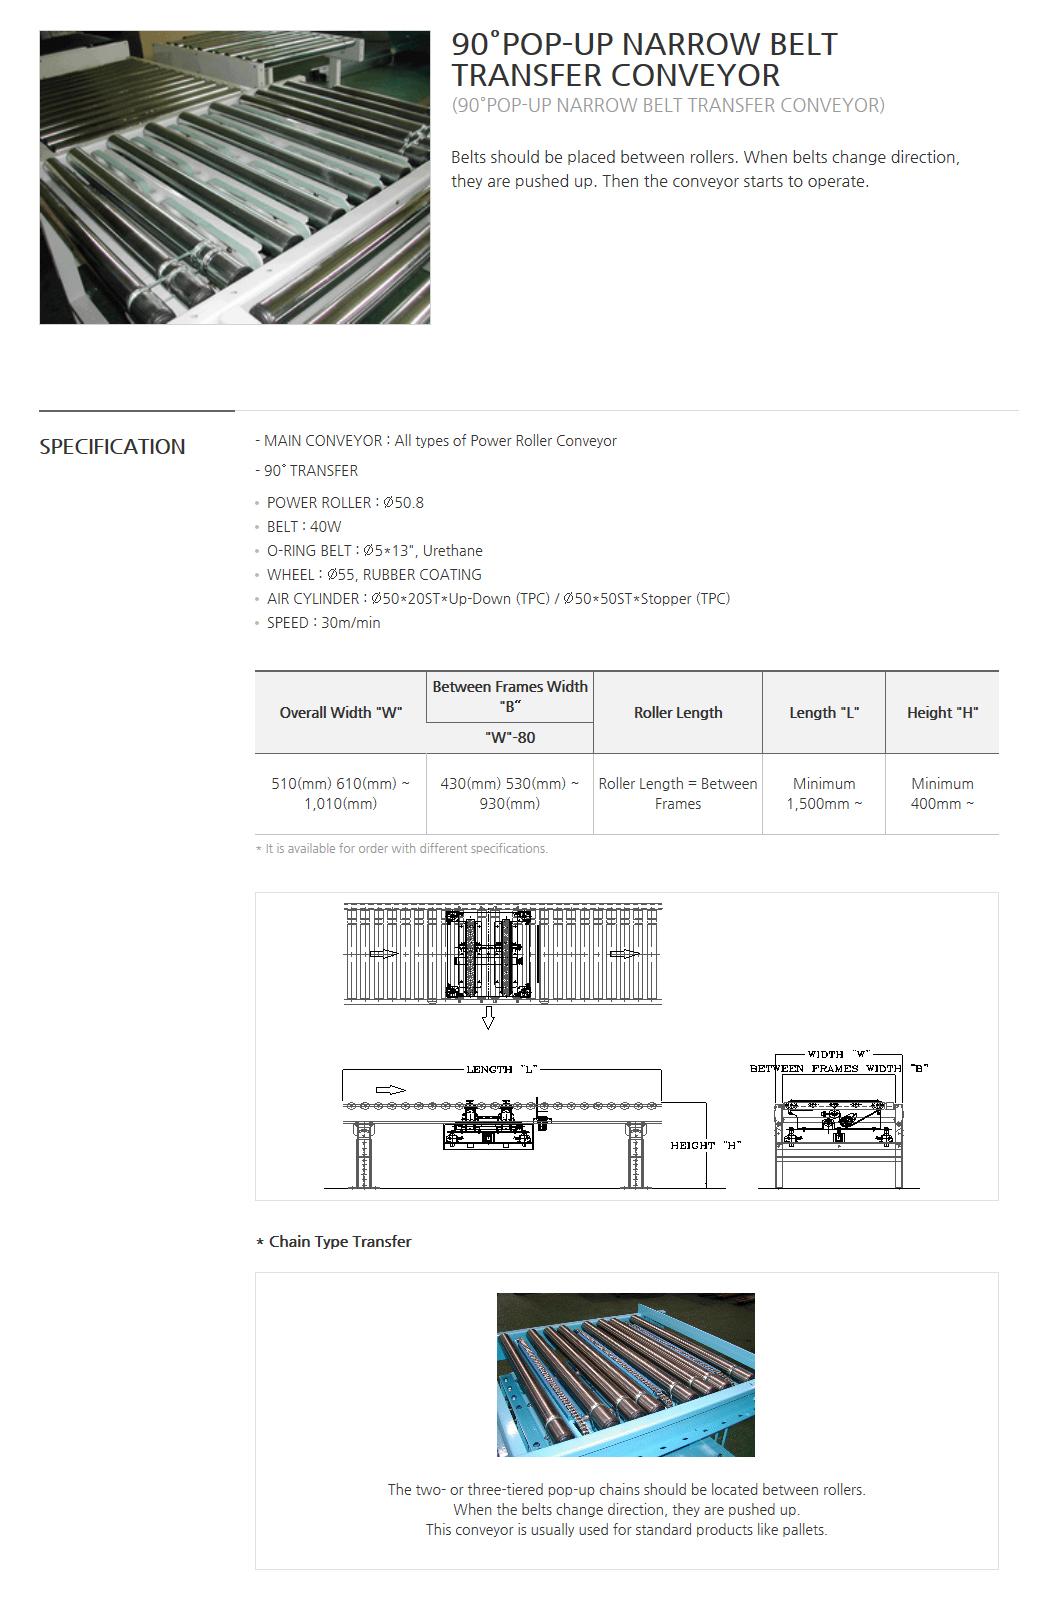 BOWOOSYSTEM Sortation Conveyor : 90 Pop-up Narrow Belt Transfer Conveyor